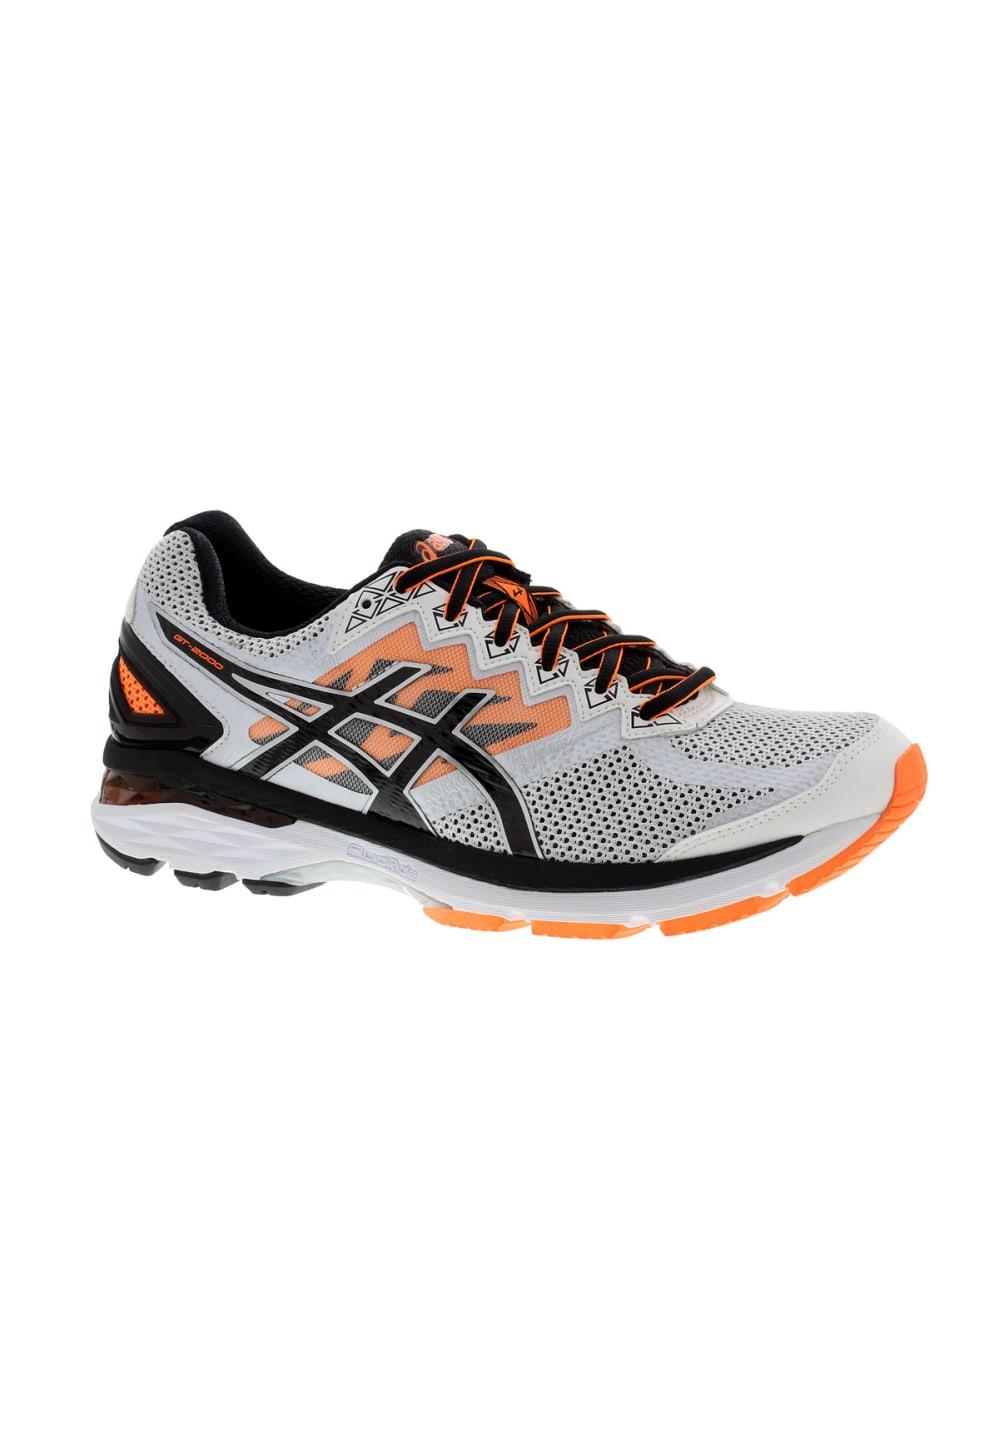 wholesale dealer 88ed8 6ad02 ASICS GT-2000 4 - Running shoes for Men - Grey